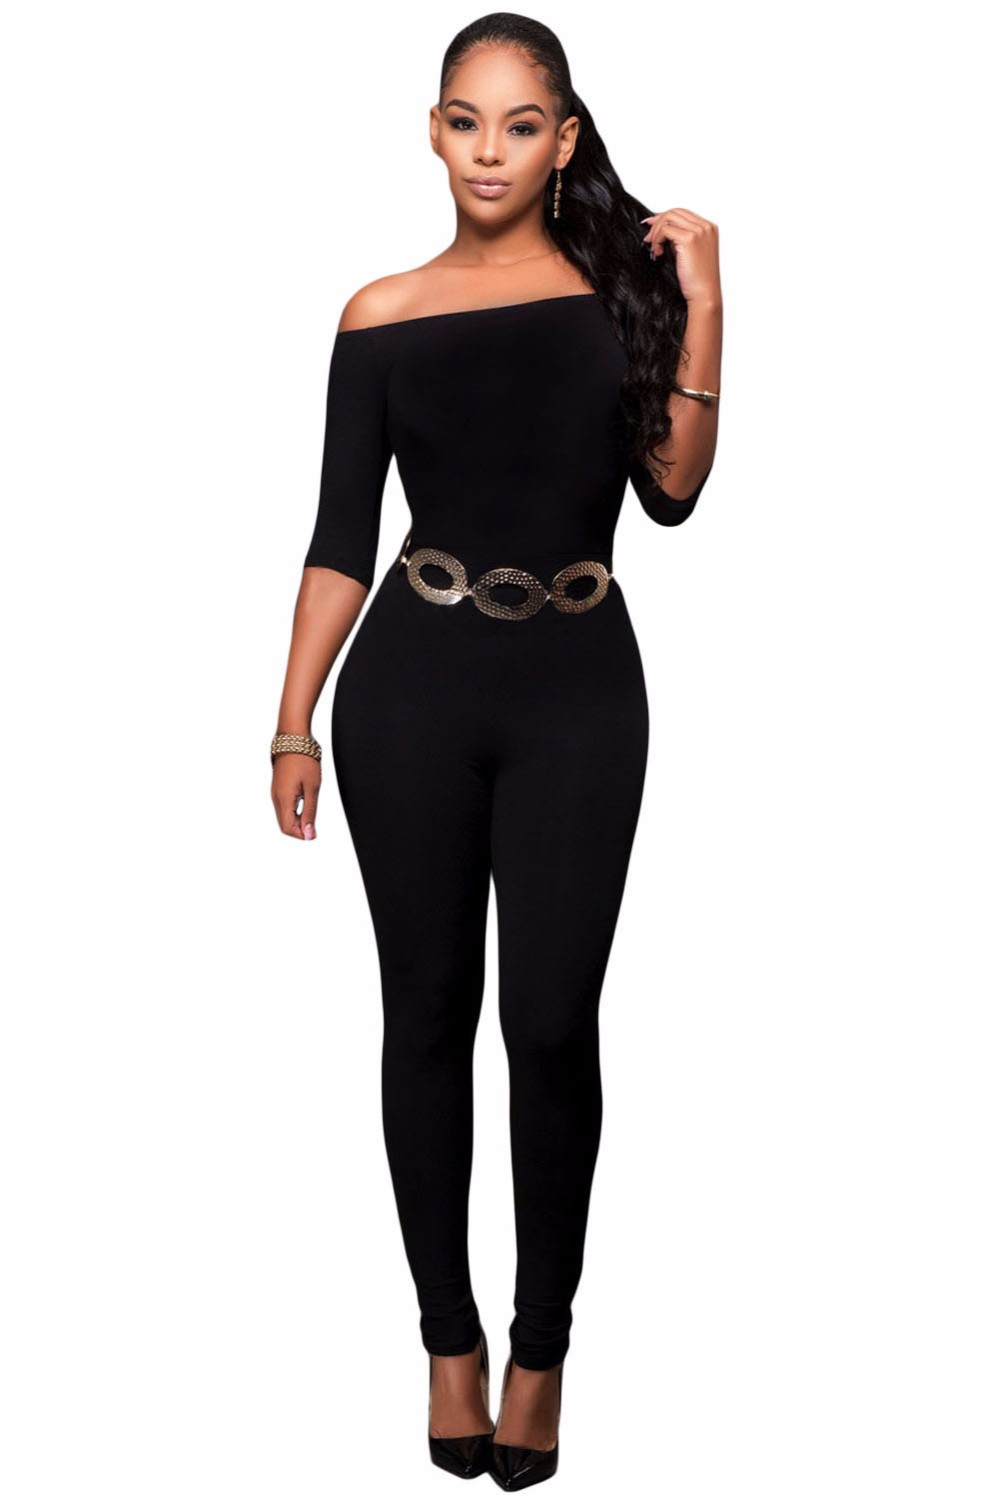 Black-Bardot-Neckline-Fashion-Jumpsuit-LC64193-2-2